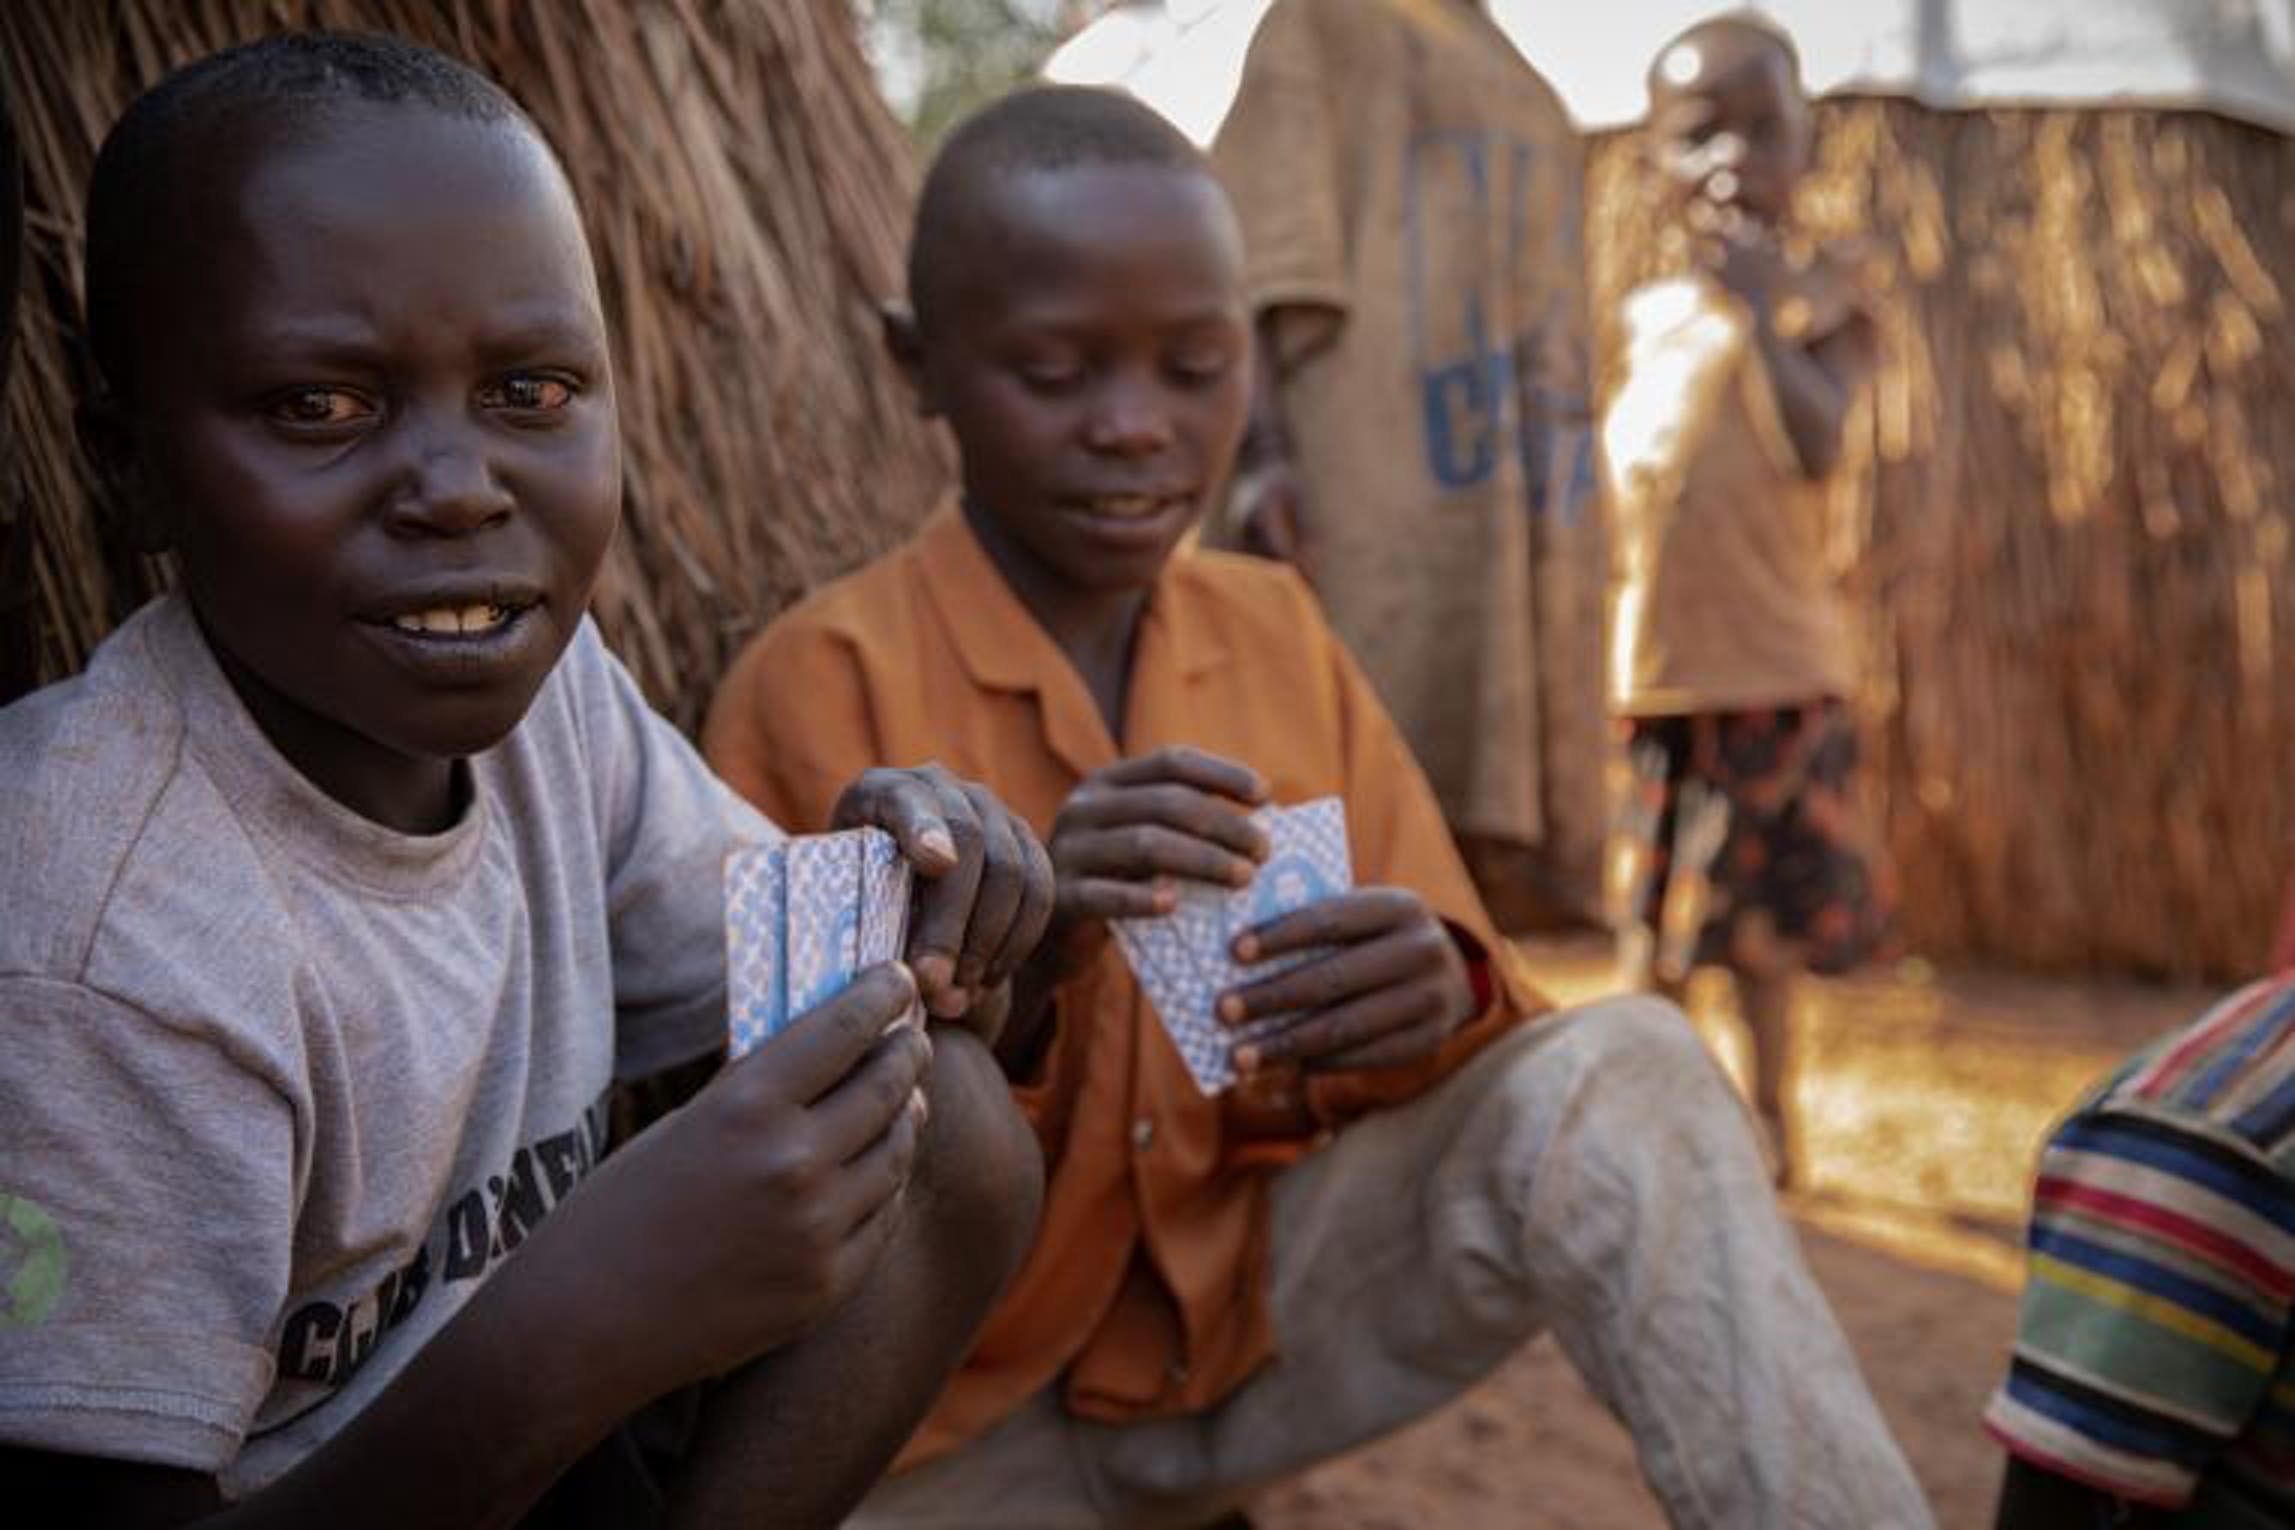 © UNICEF/UNI329862/Desjardins